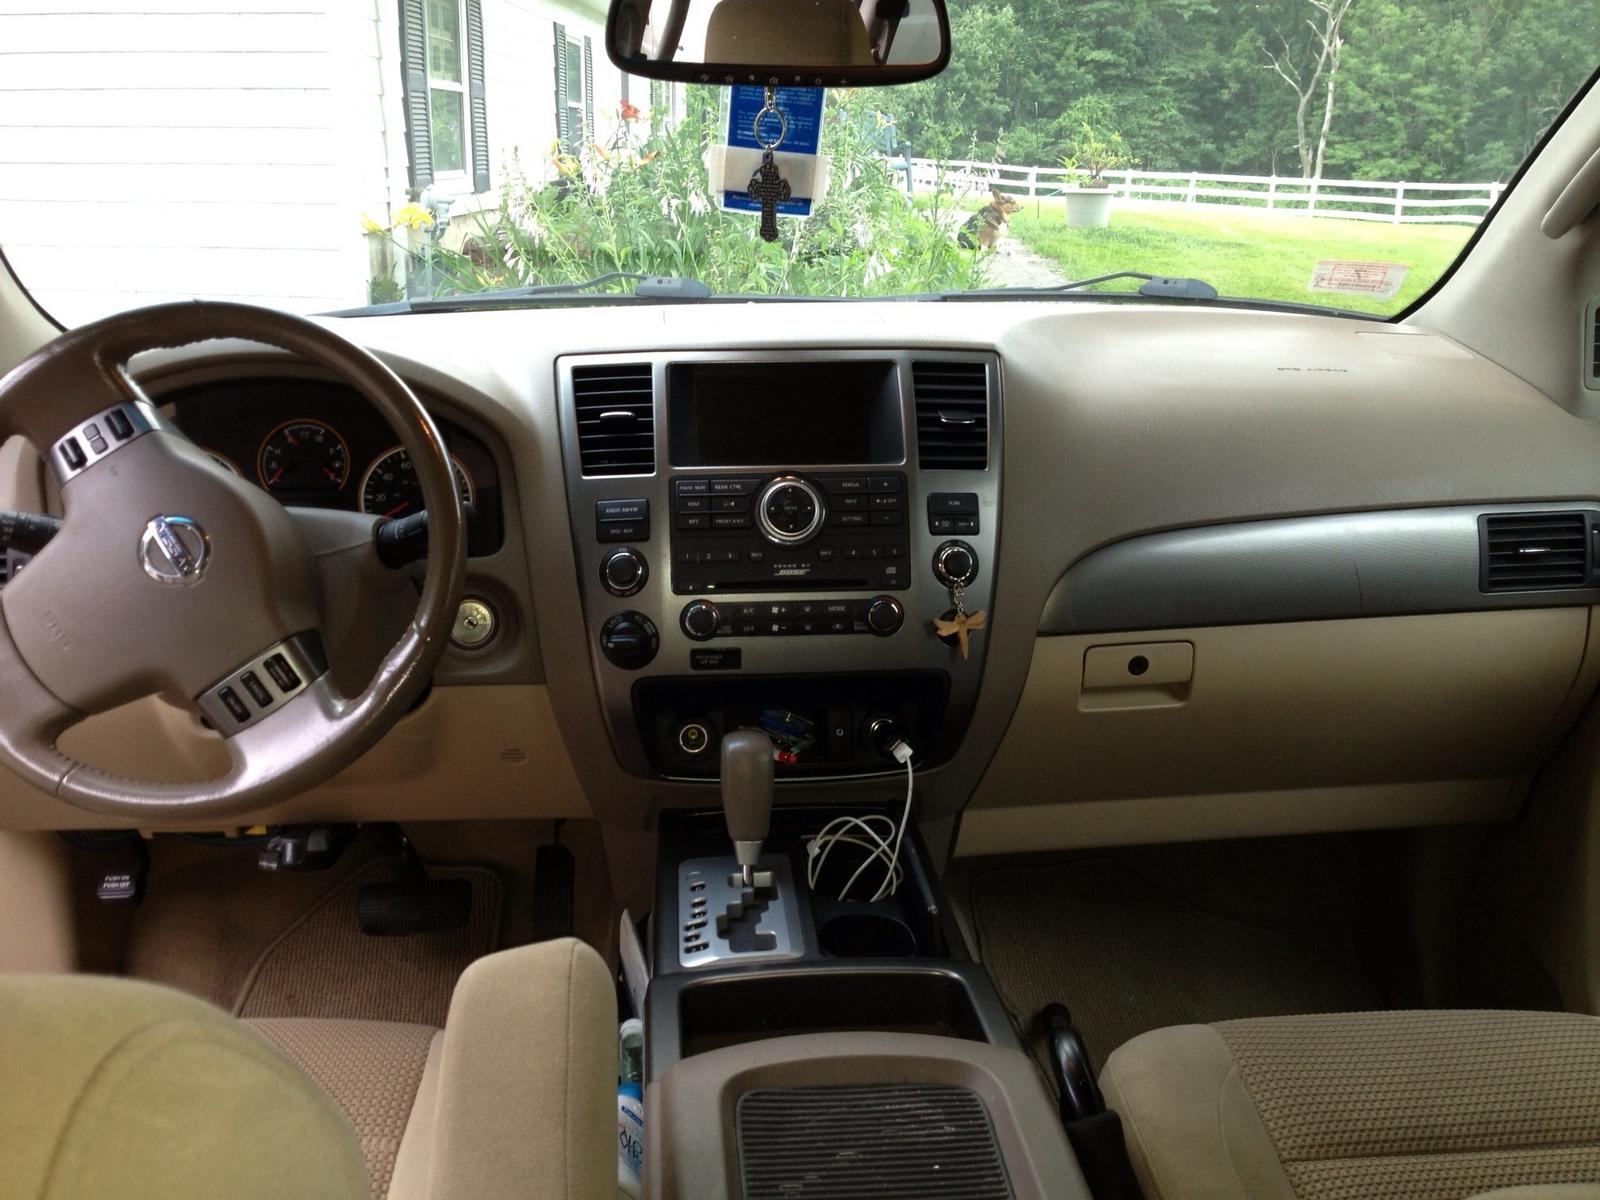 2008 Nissan Armada Interior Dimensions